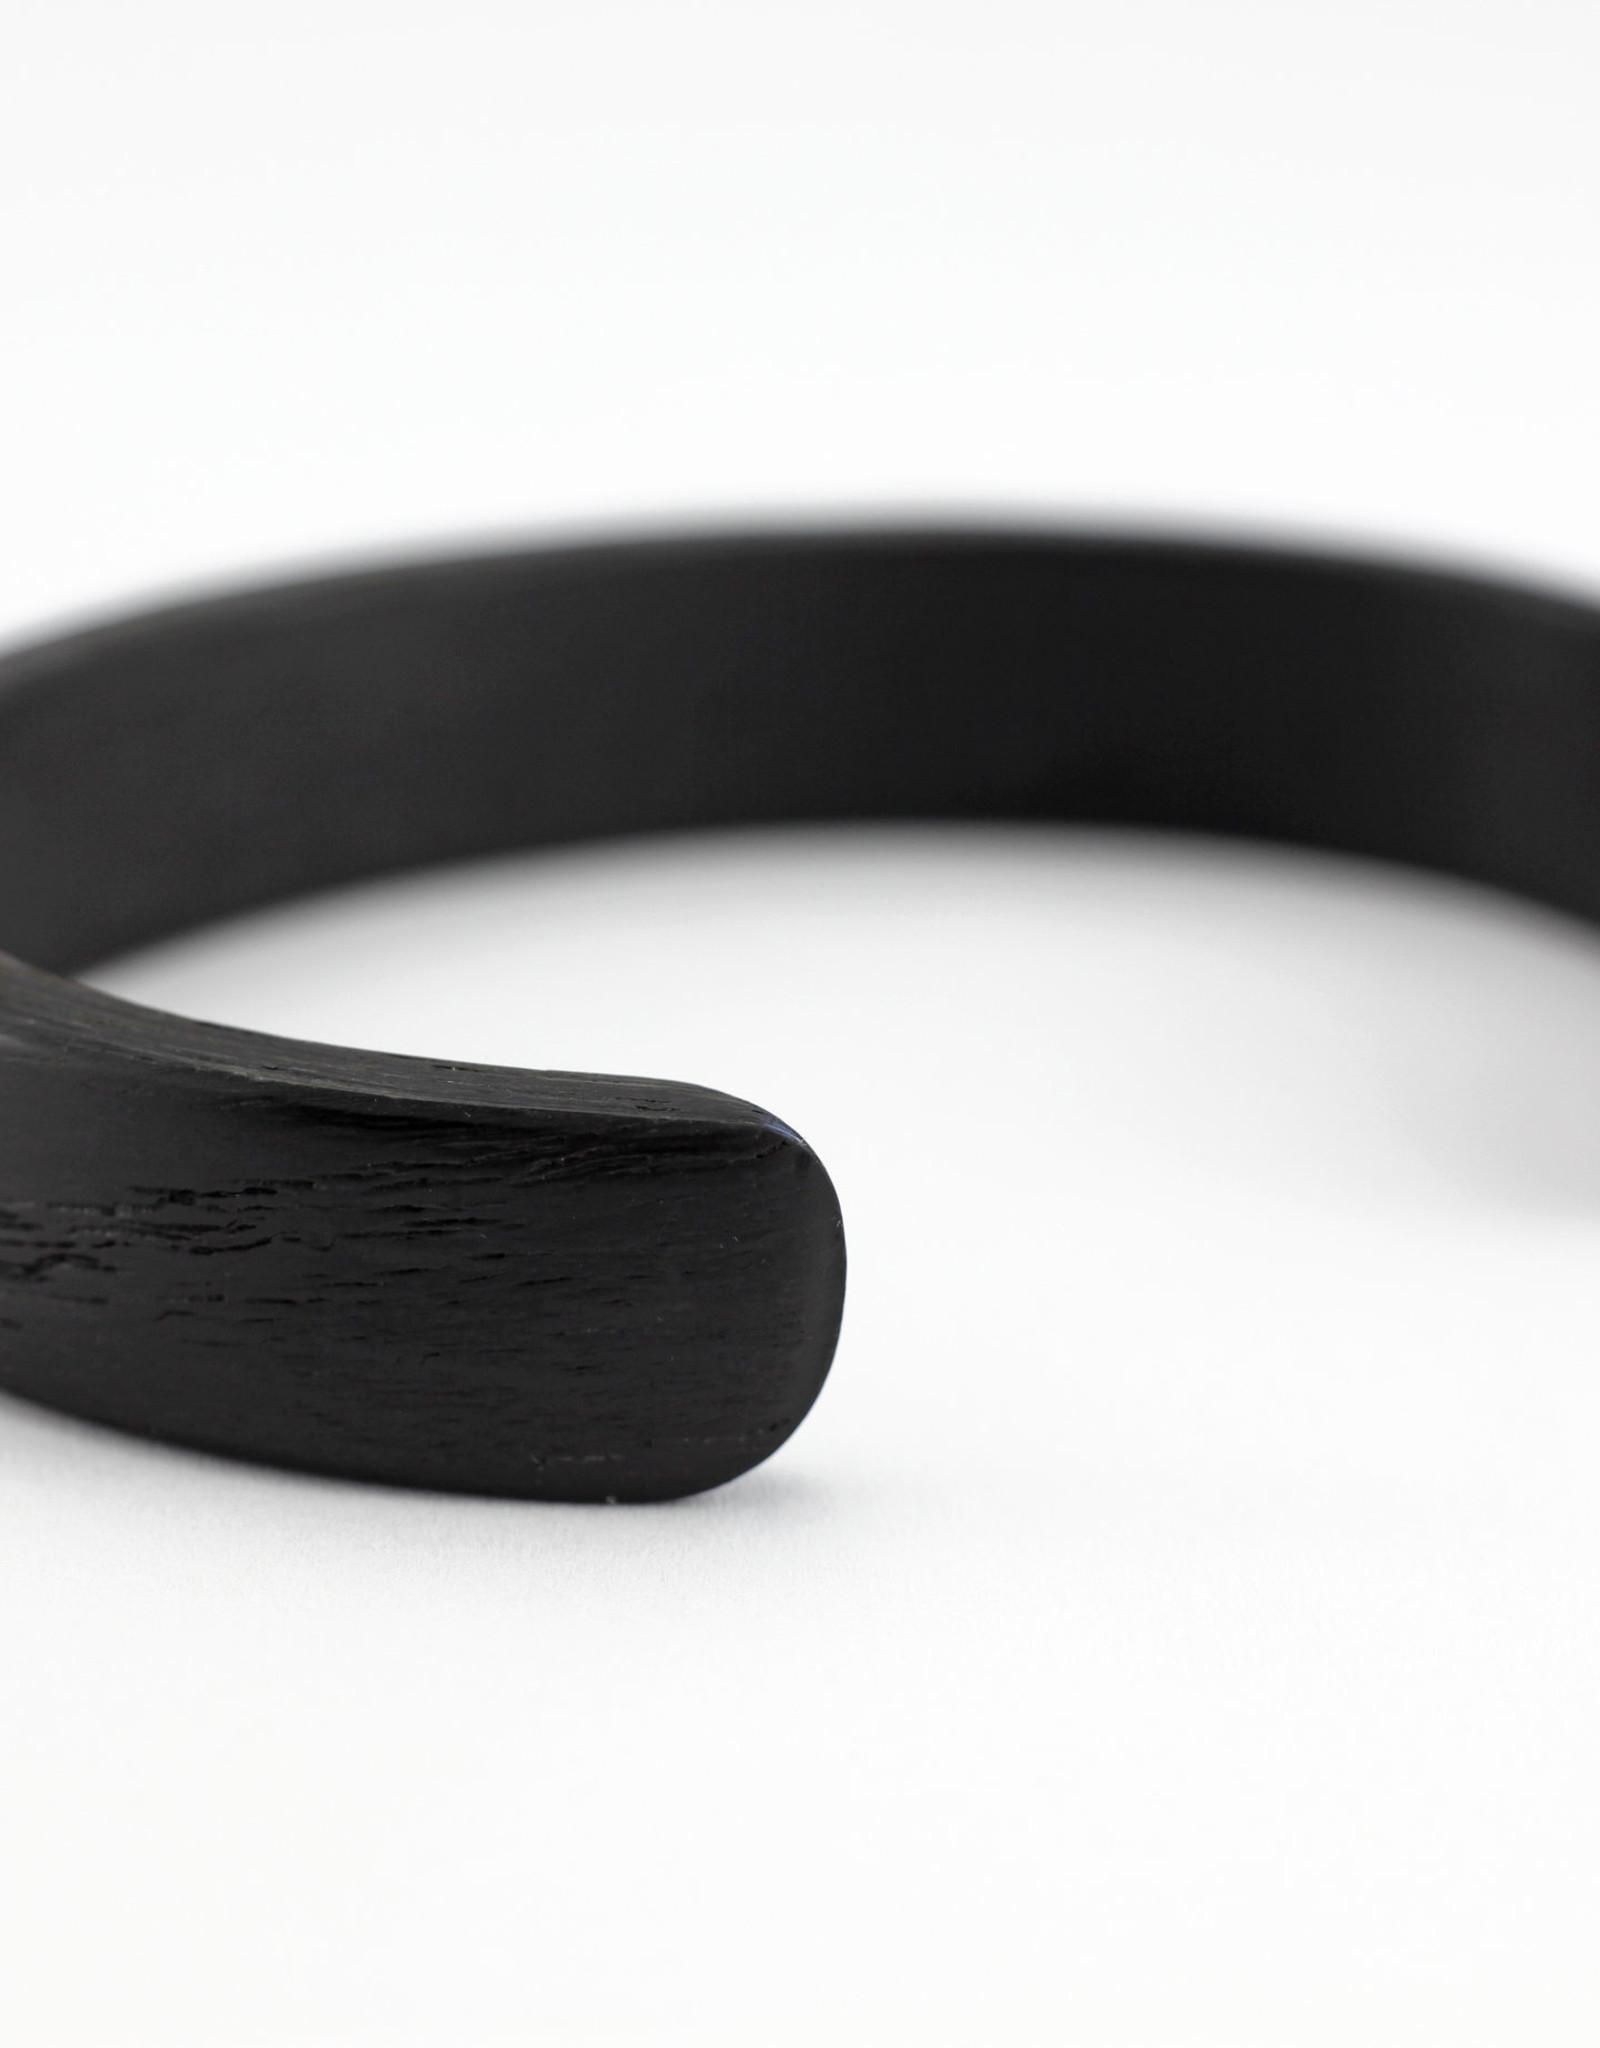 Leko & Leko Jewellery Leko & Leko - Bracelet